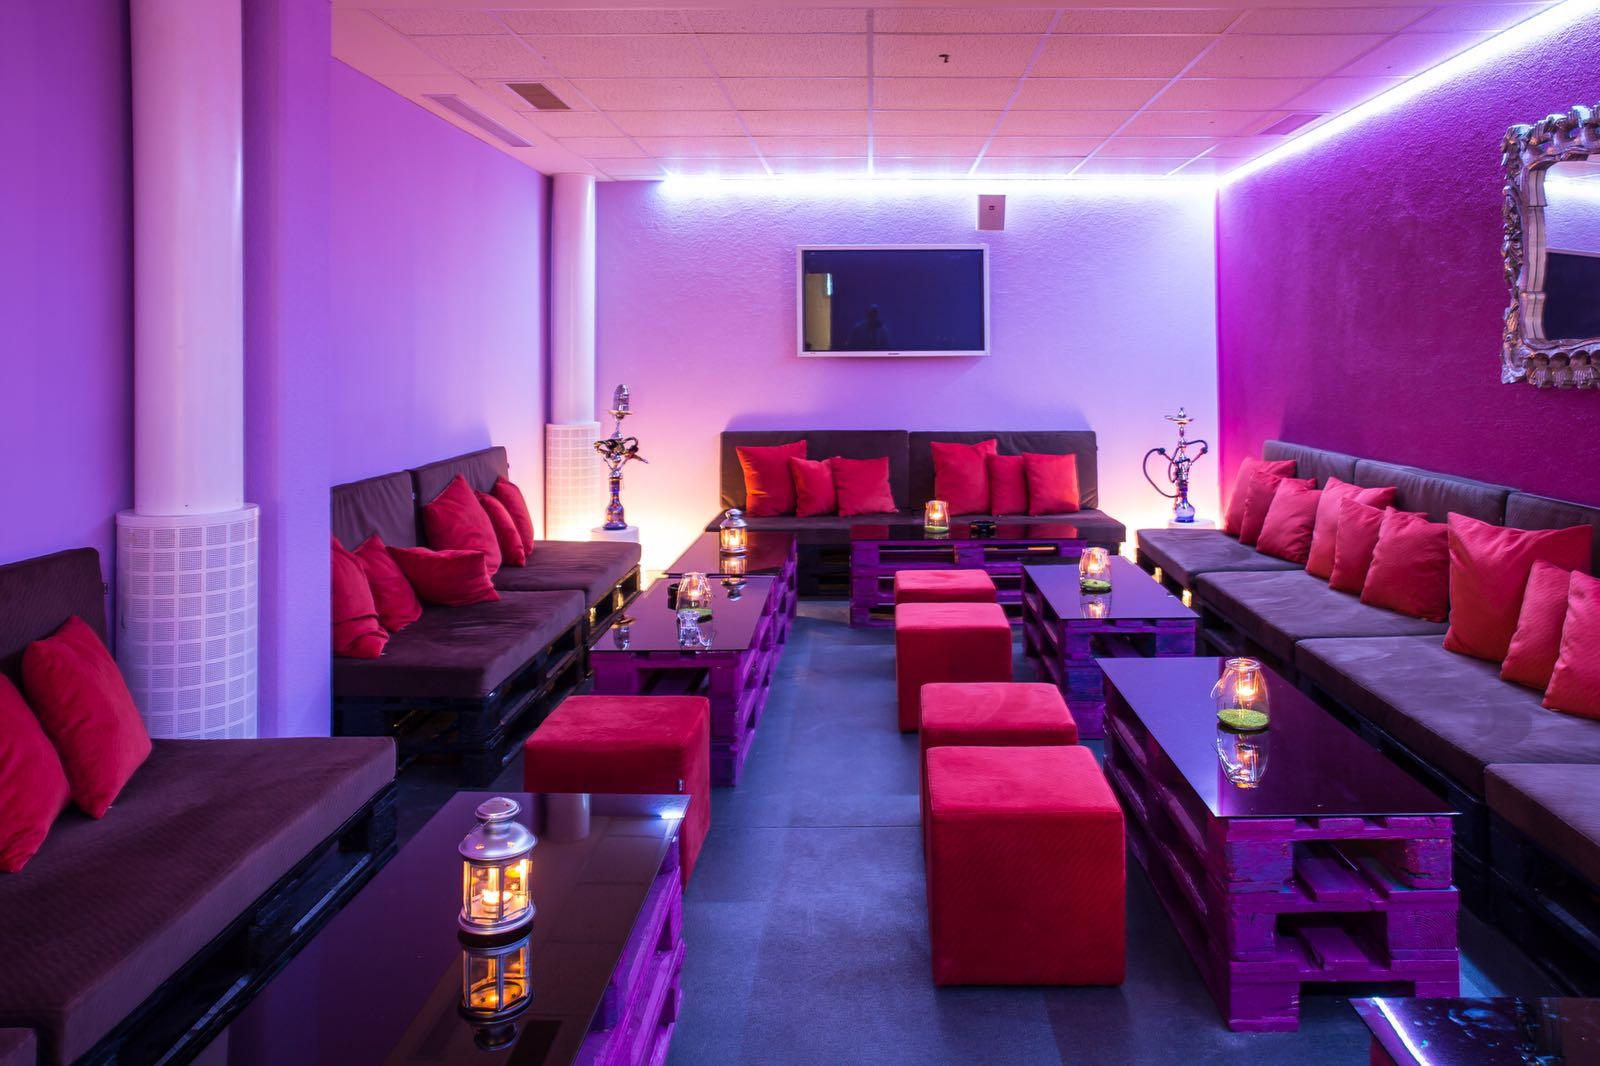 shishalounge restaurant bar dalmatino in bern. Black Bedroom Furniture Sets. Home Design Ideas